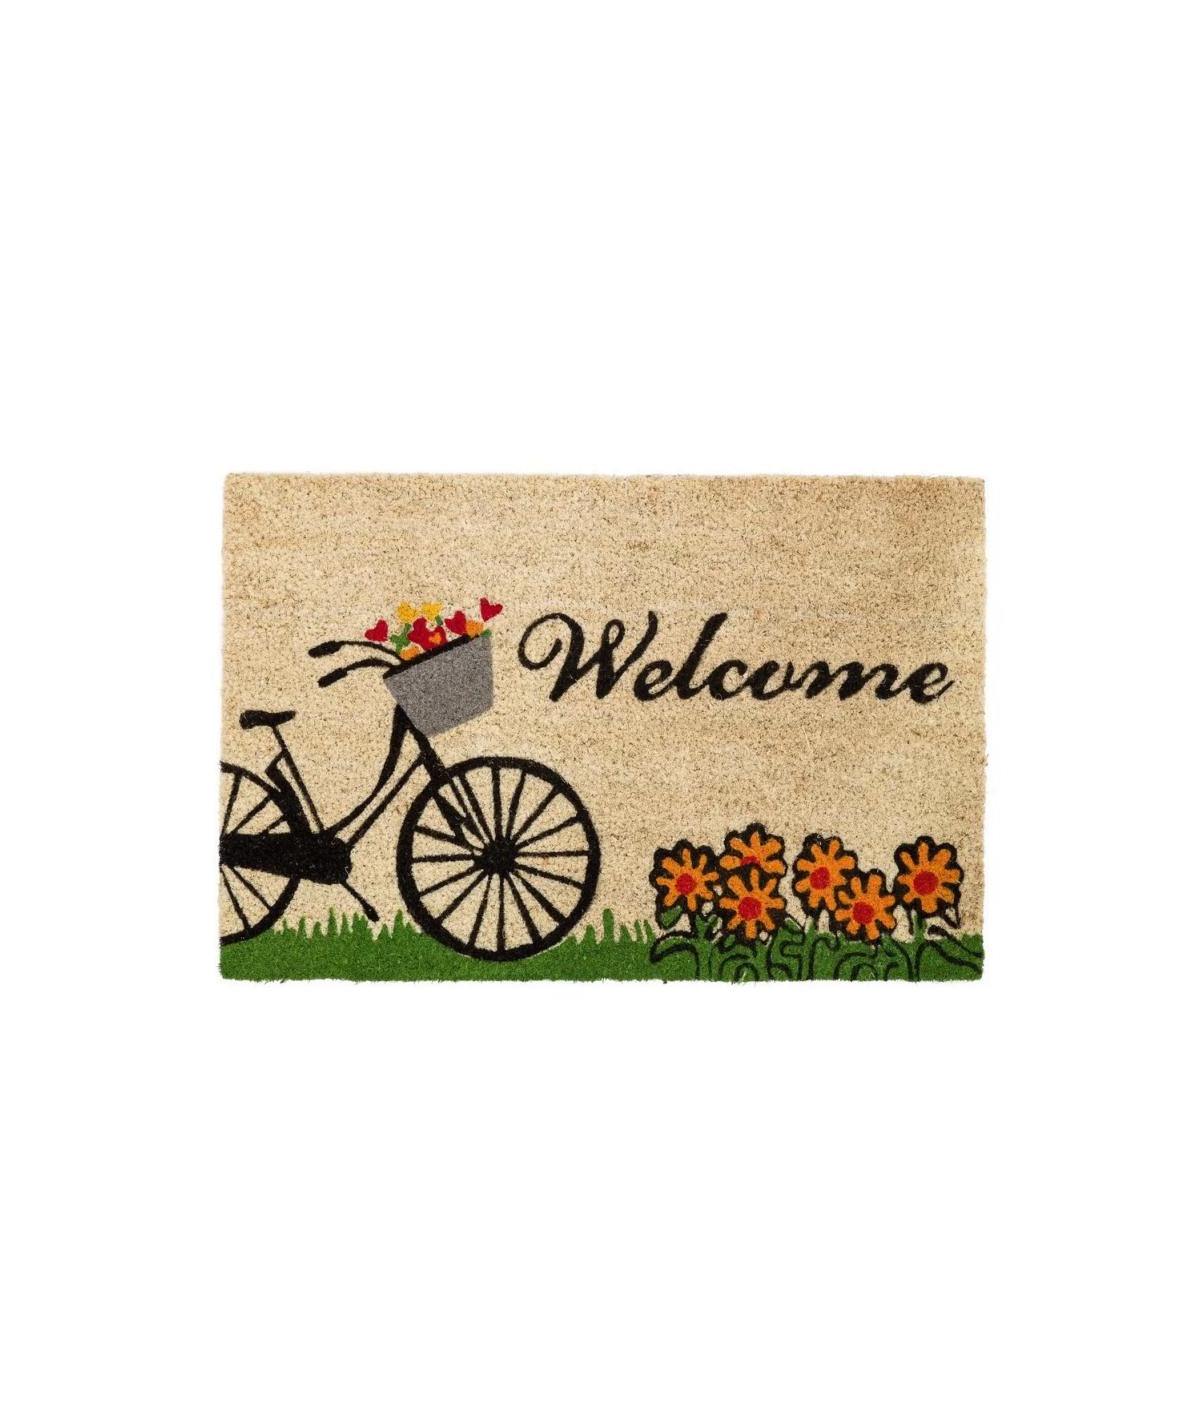 Paillasson en coco vélo fleuri 60x40cm - Welcome   Yesdeko